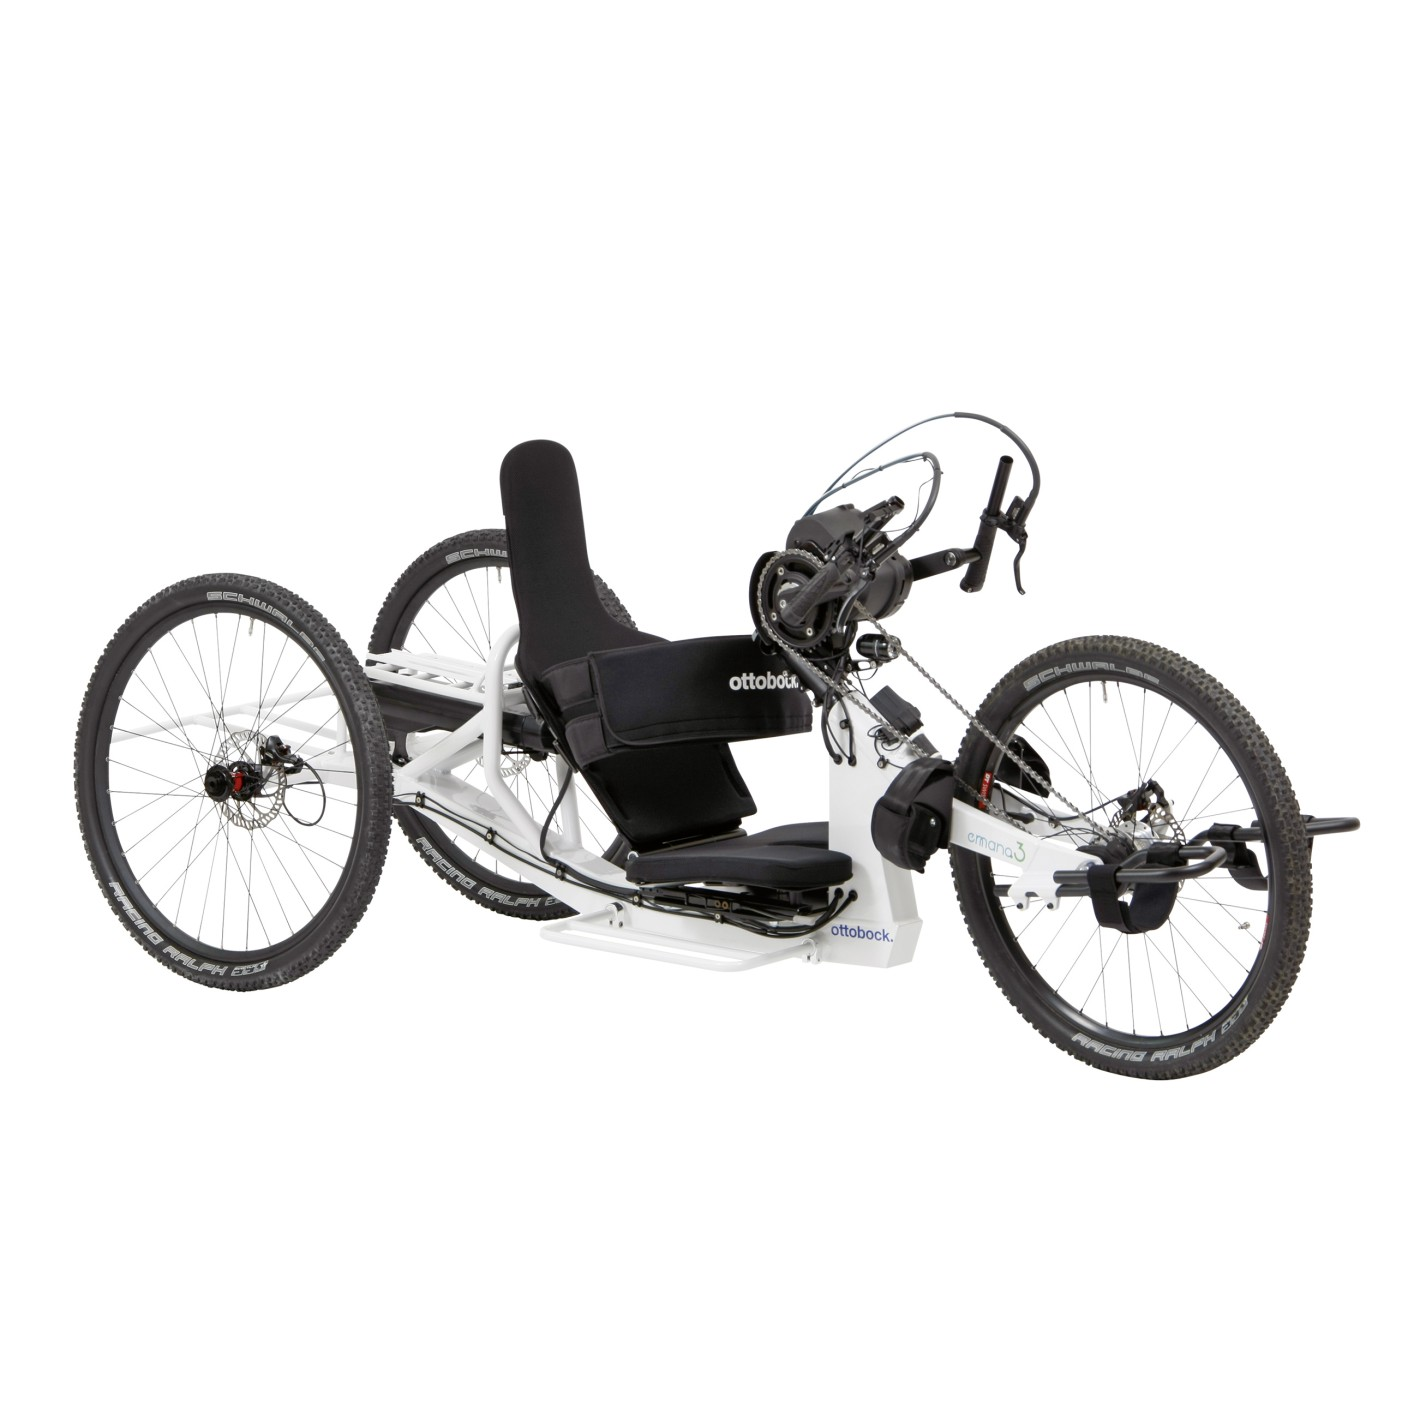 handbike emano 3 ottobock nl. Black Bedroom Furniture Sets. Home Design Ideas